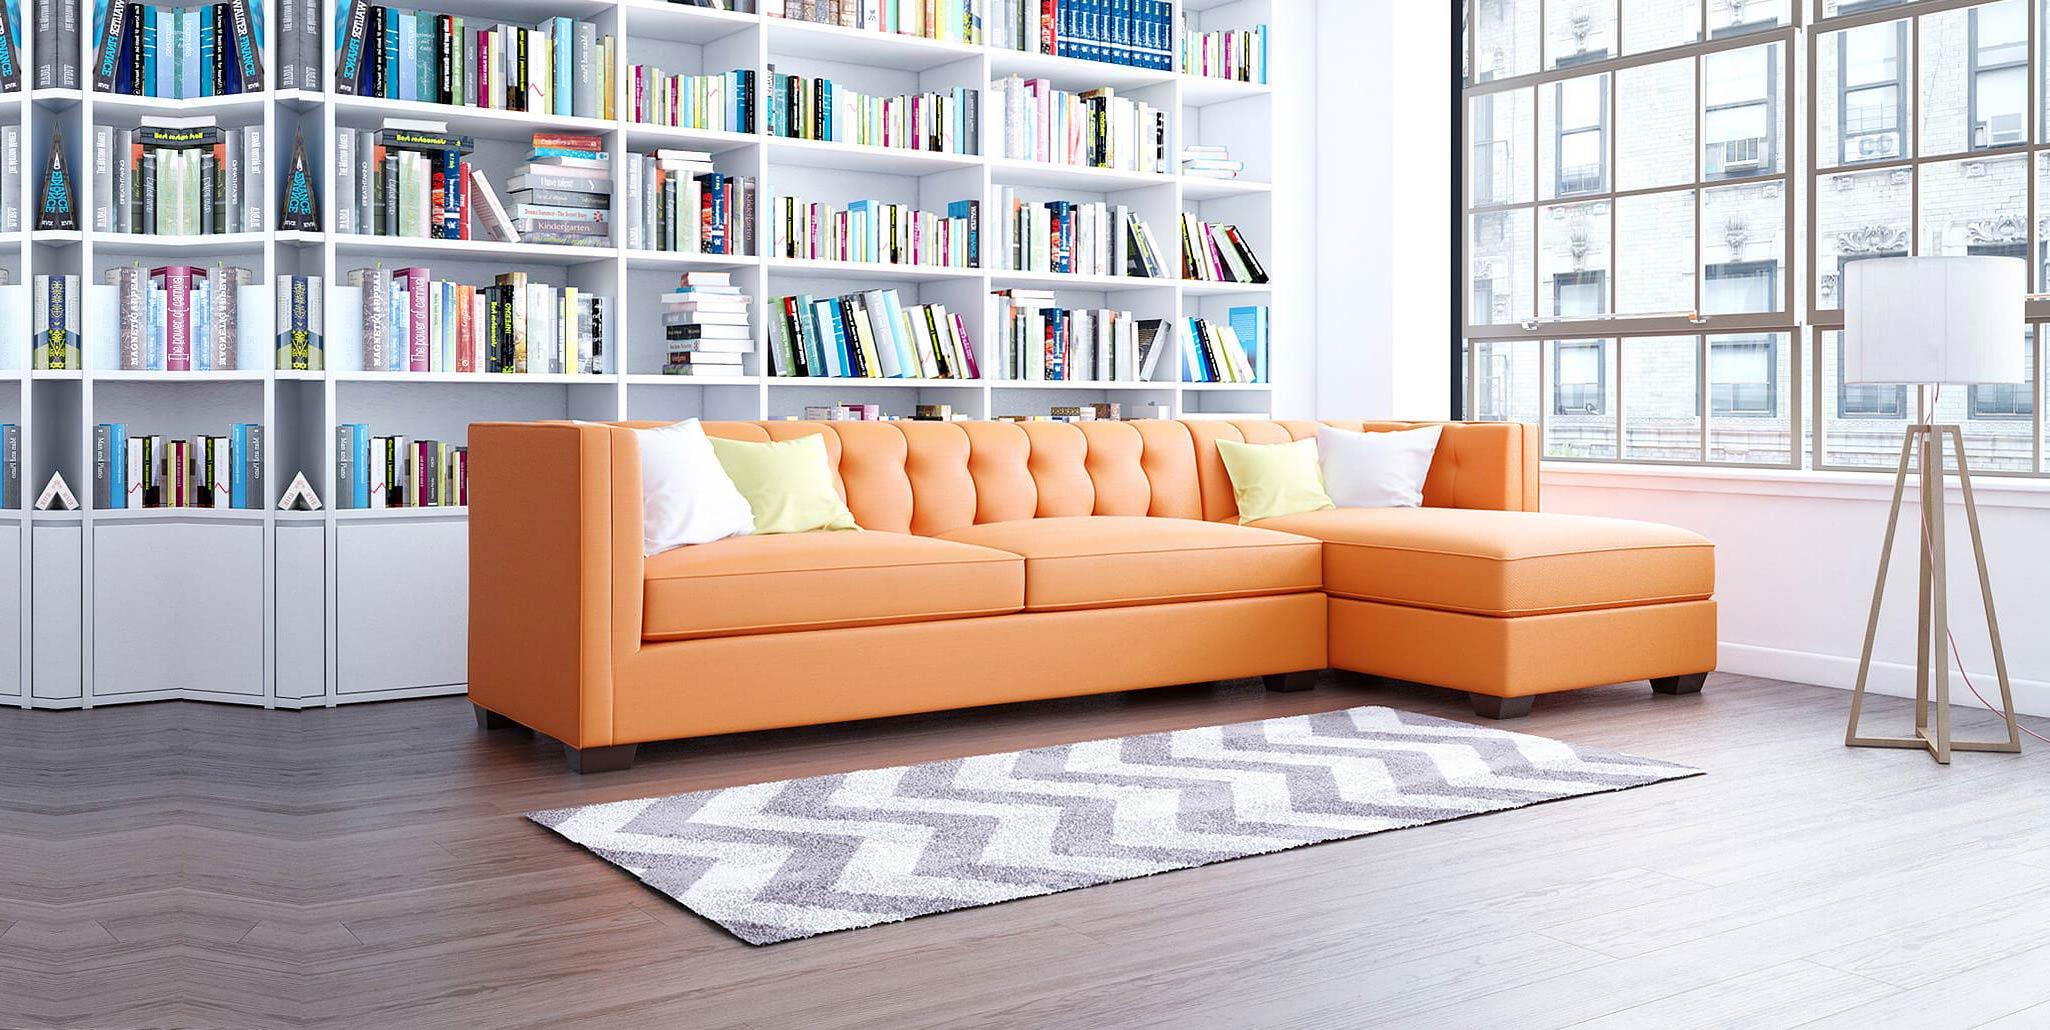 grant panel furniture gallery 1